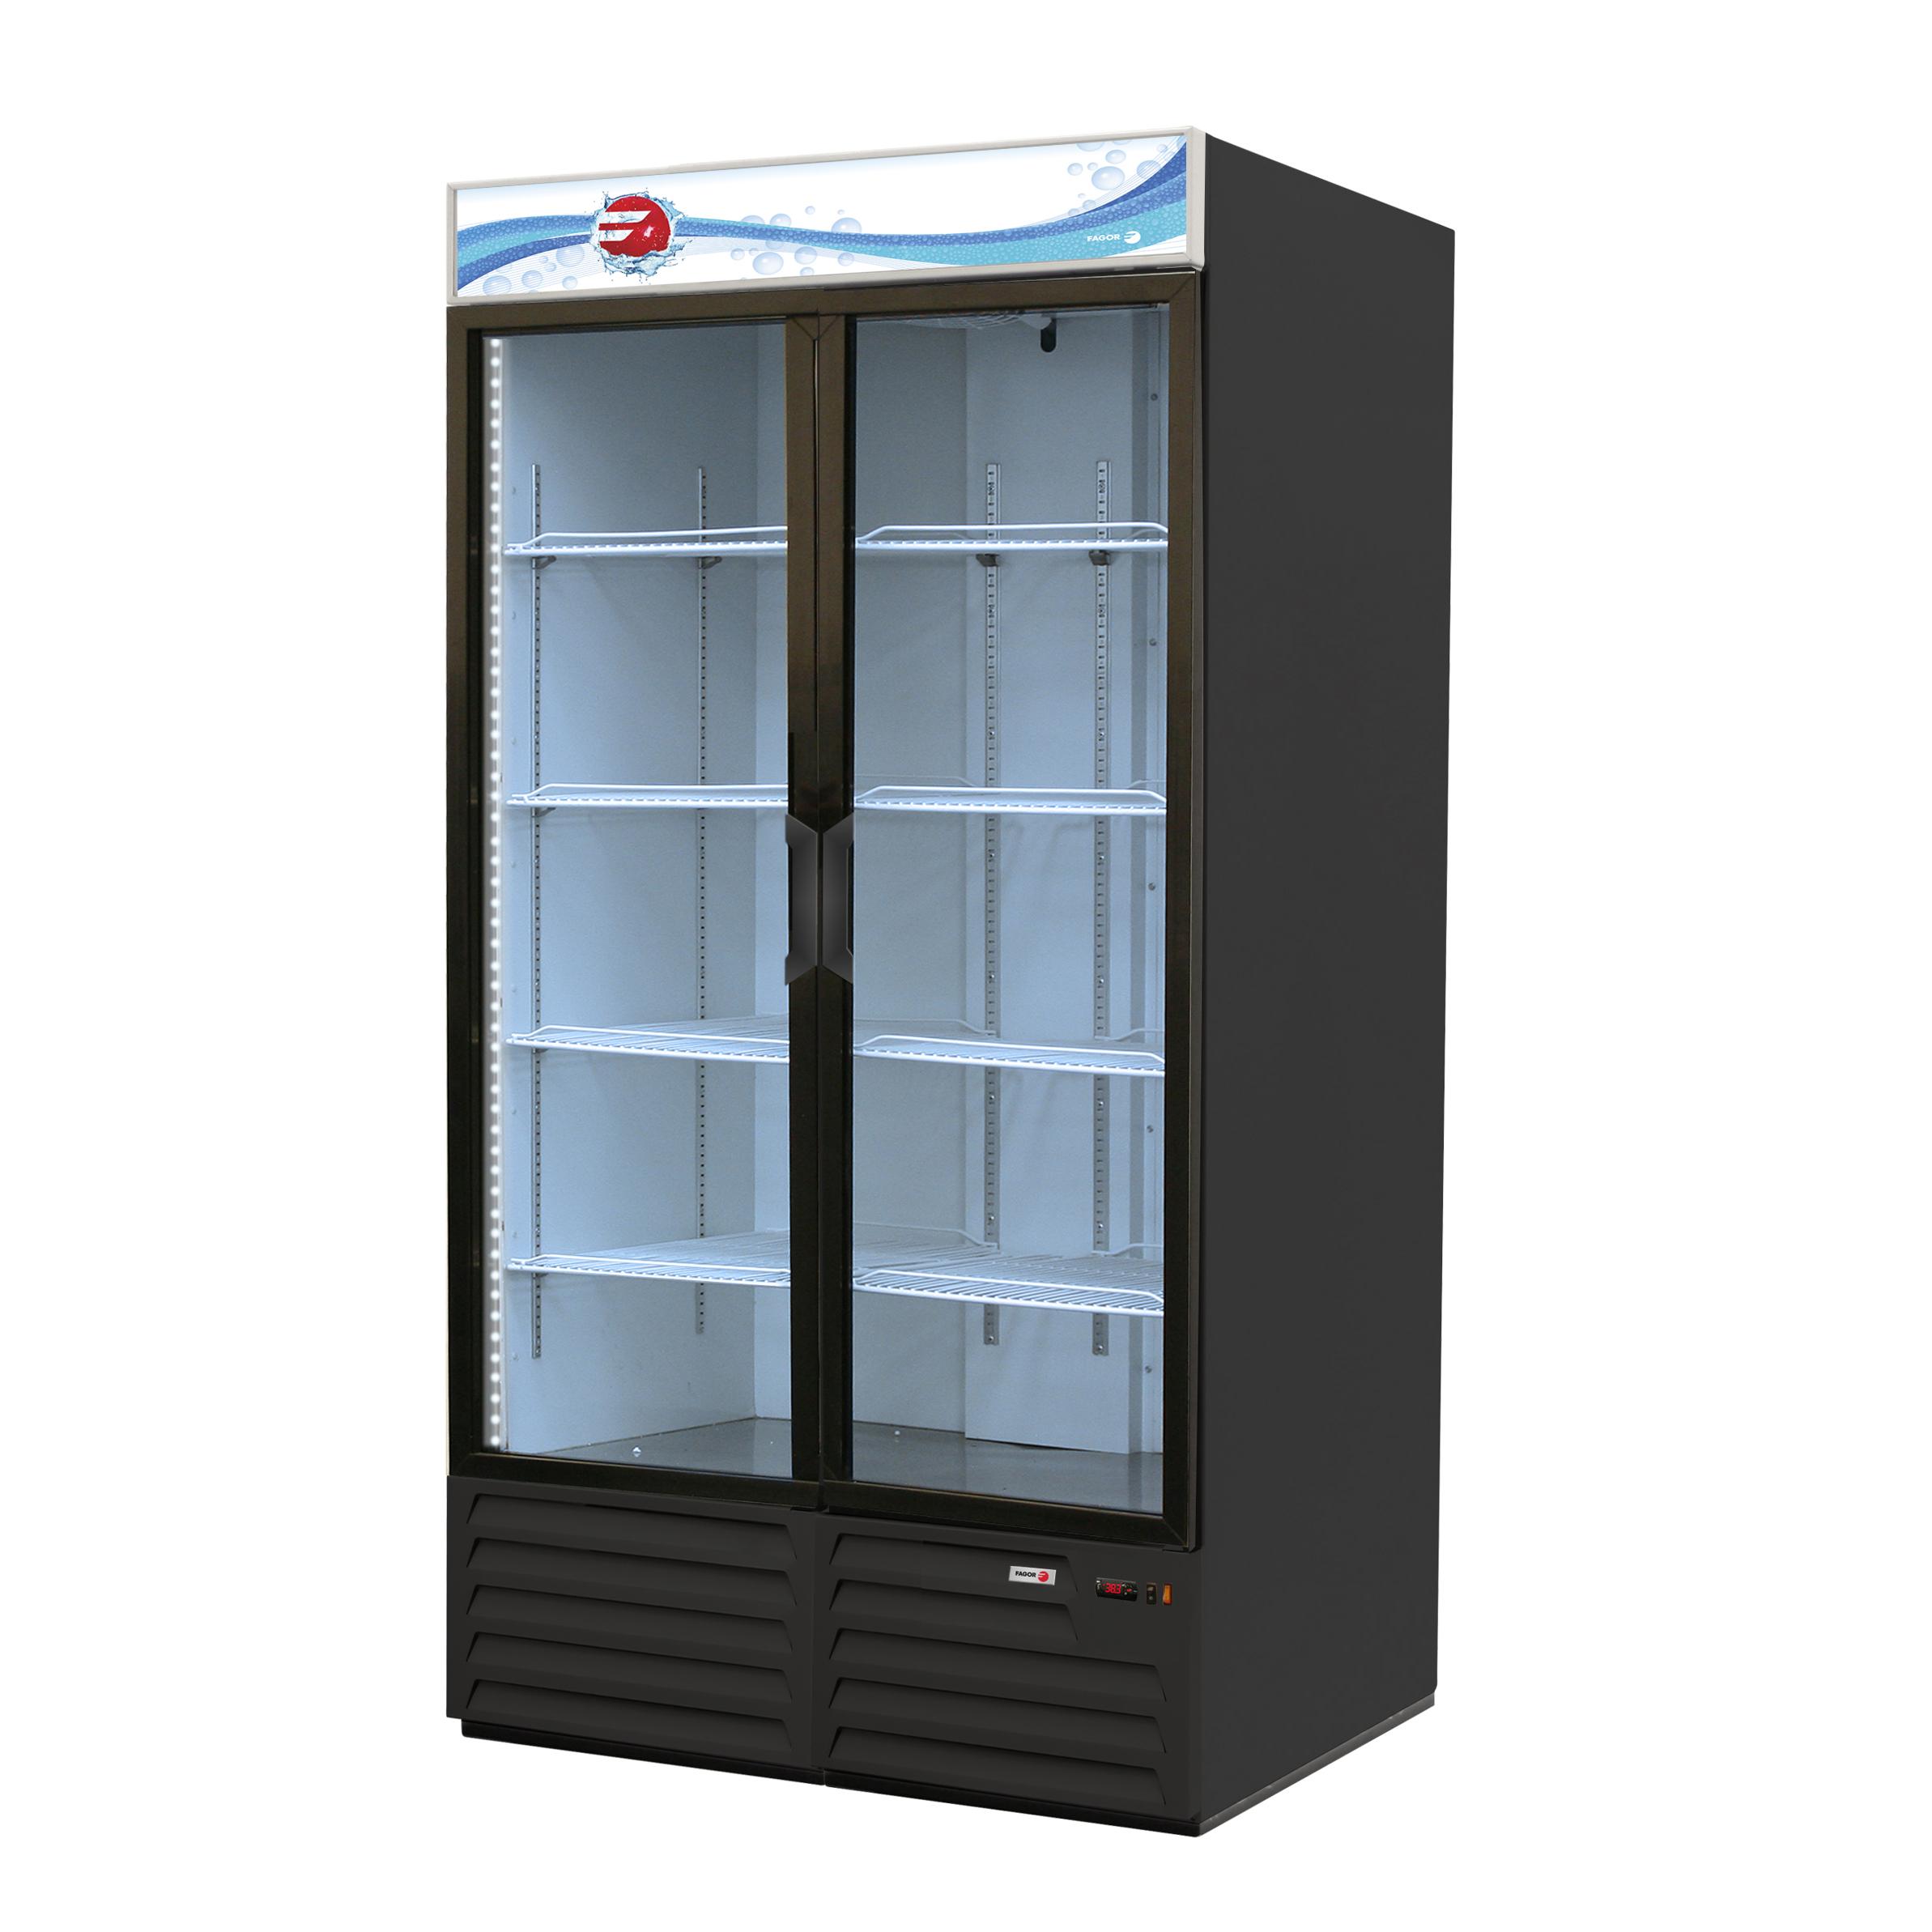 FMD-49 Fagor Refrigeration refrigerator, merchandiser